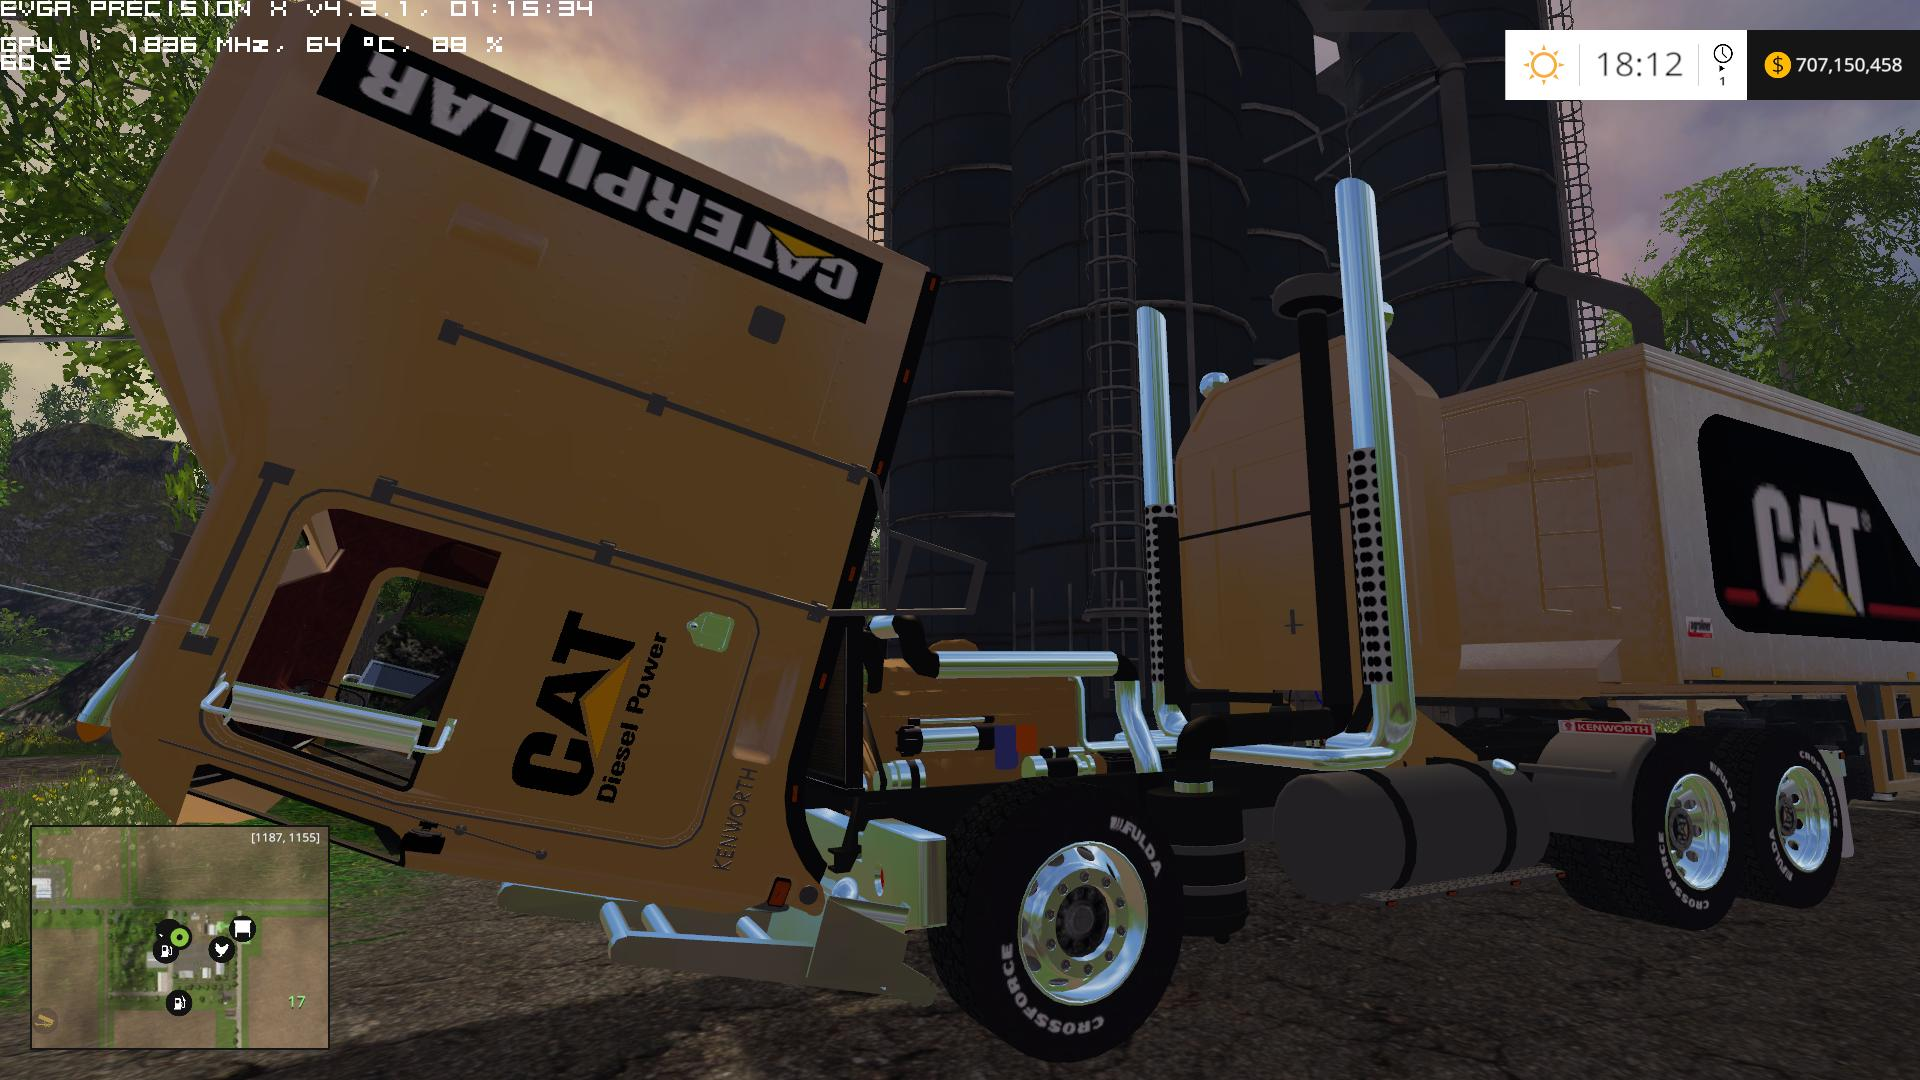 CAT - TRUCK + TRAILER 350 000 LITERS MOD for LS15 - Farming